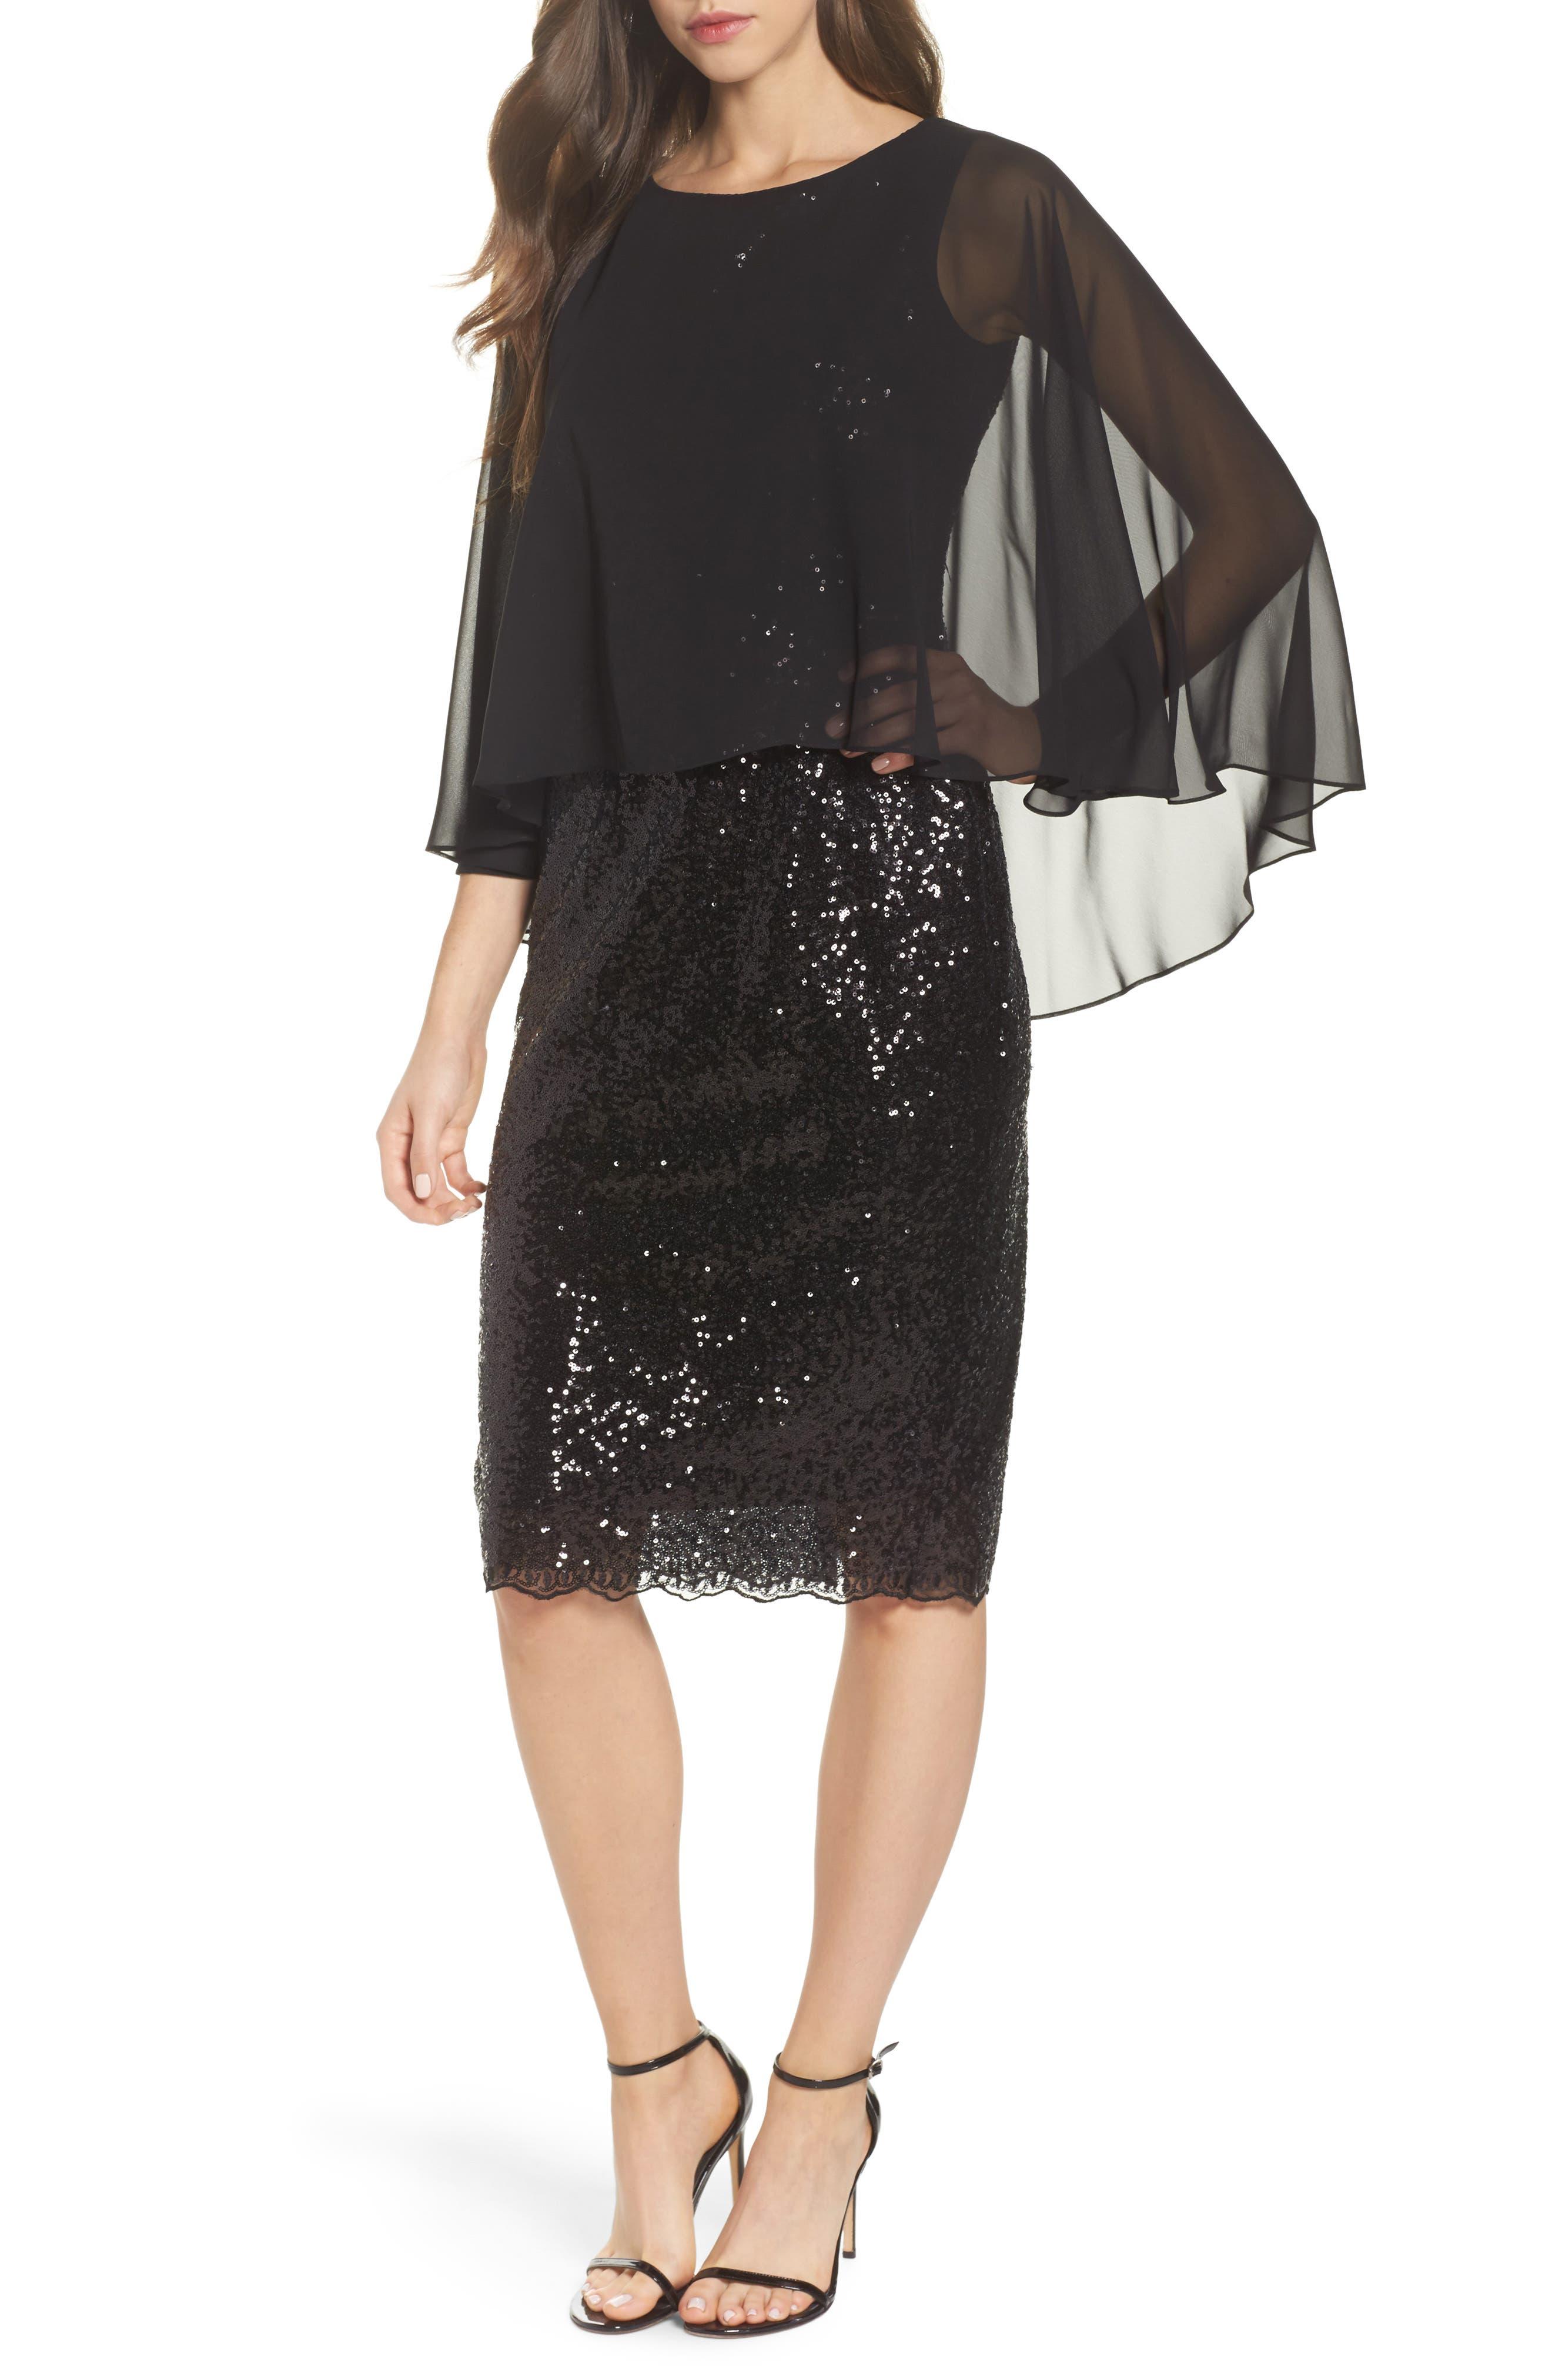 Alternate Image 1 Selected - Alex Evenings Capelet Sequin Shift Dress